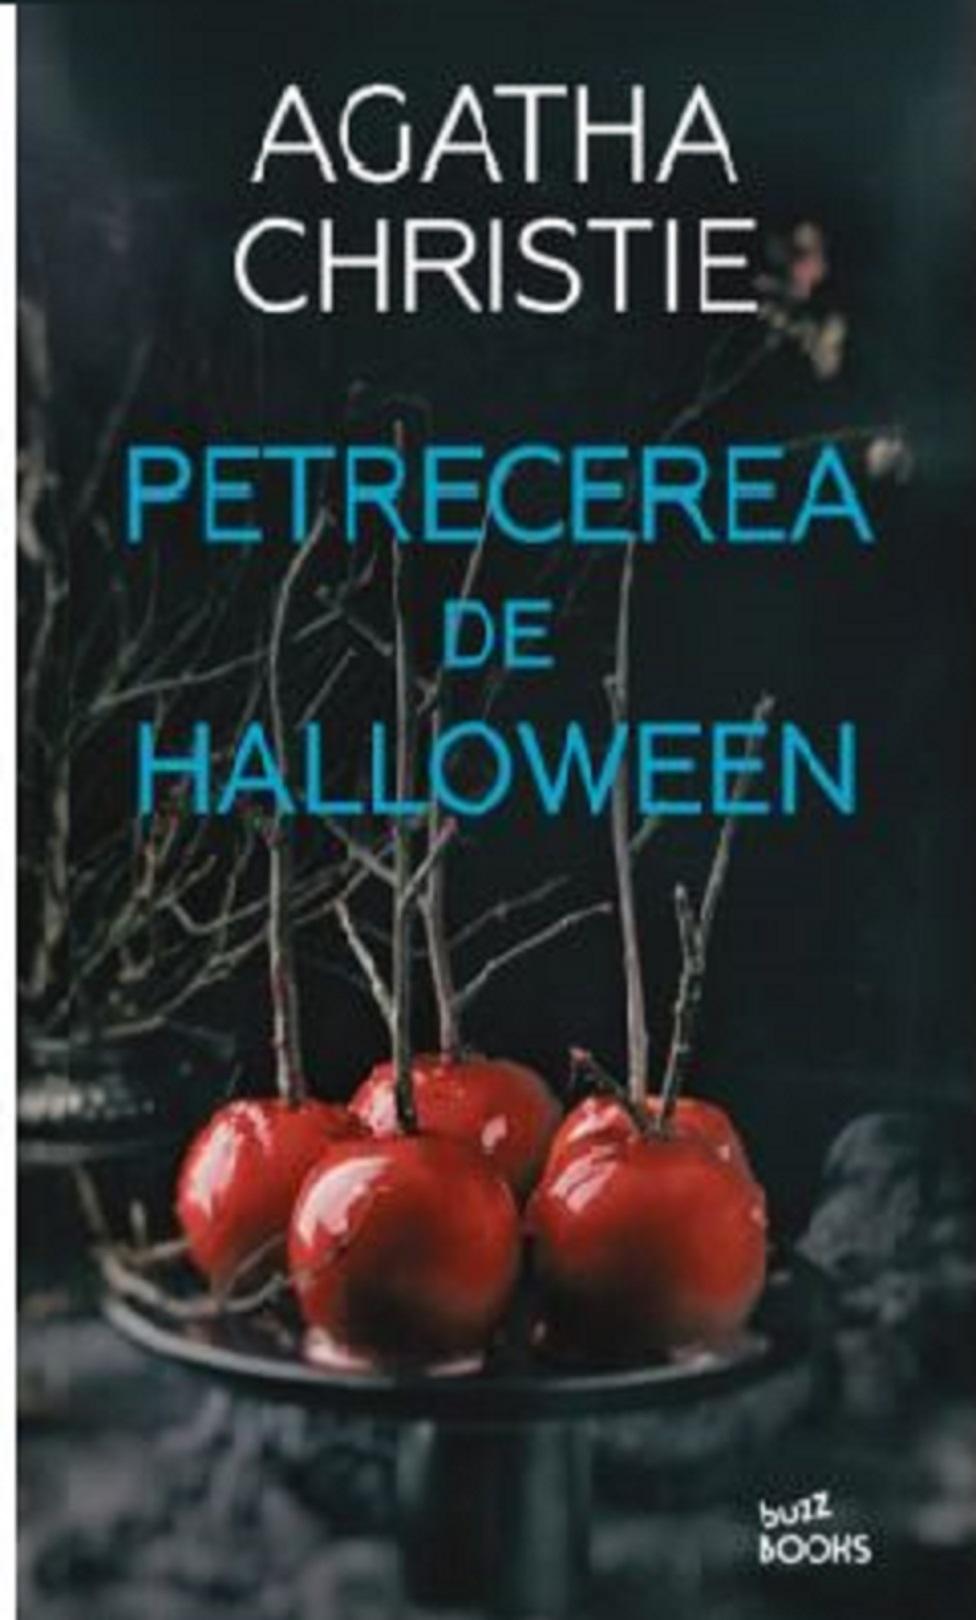 Petrecerea de Halloween | Agatha Christie